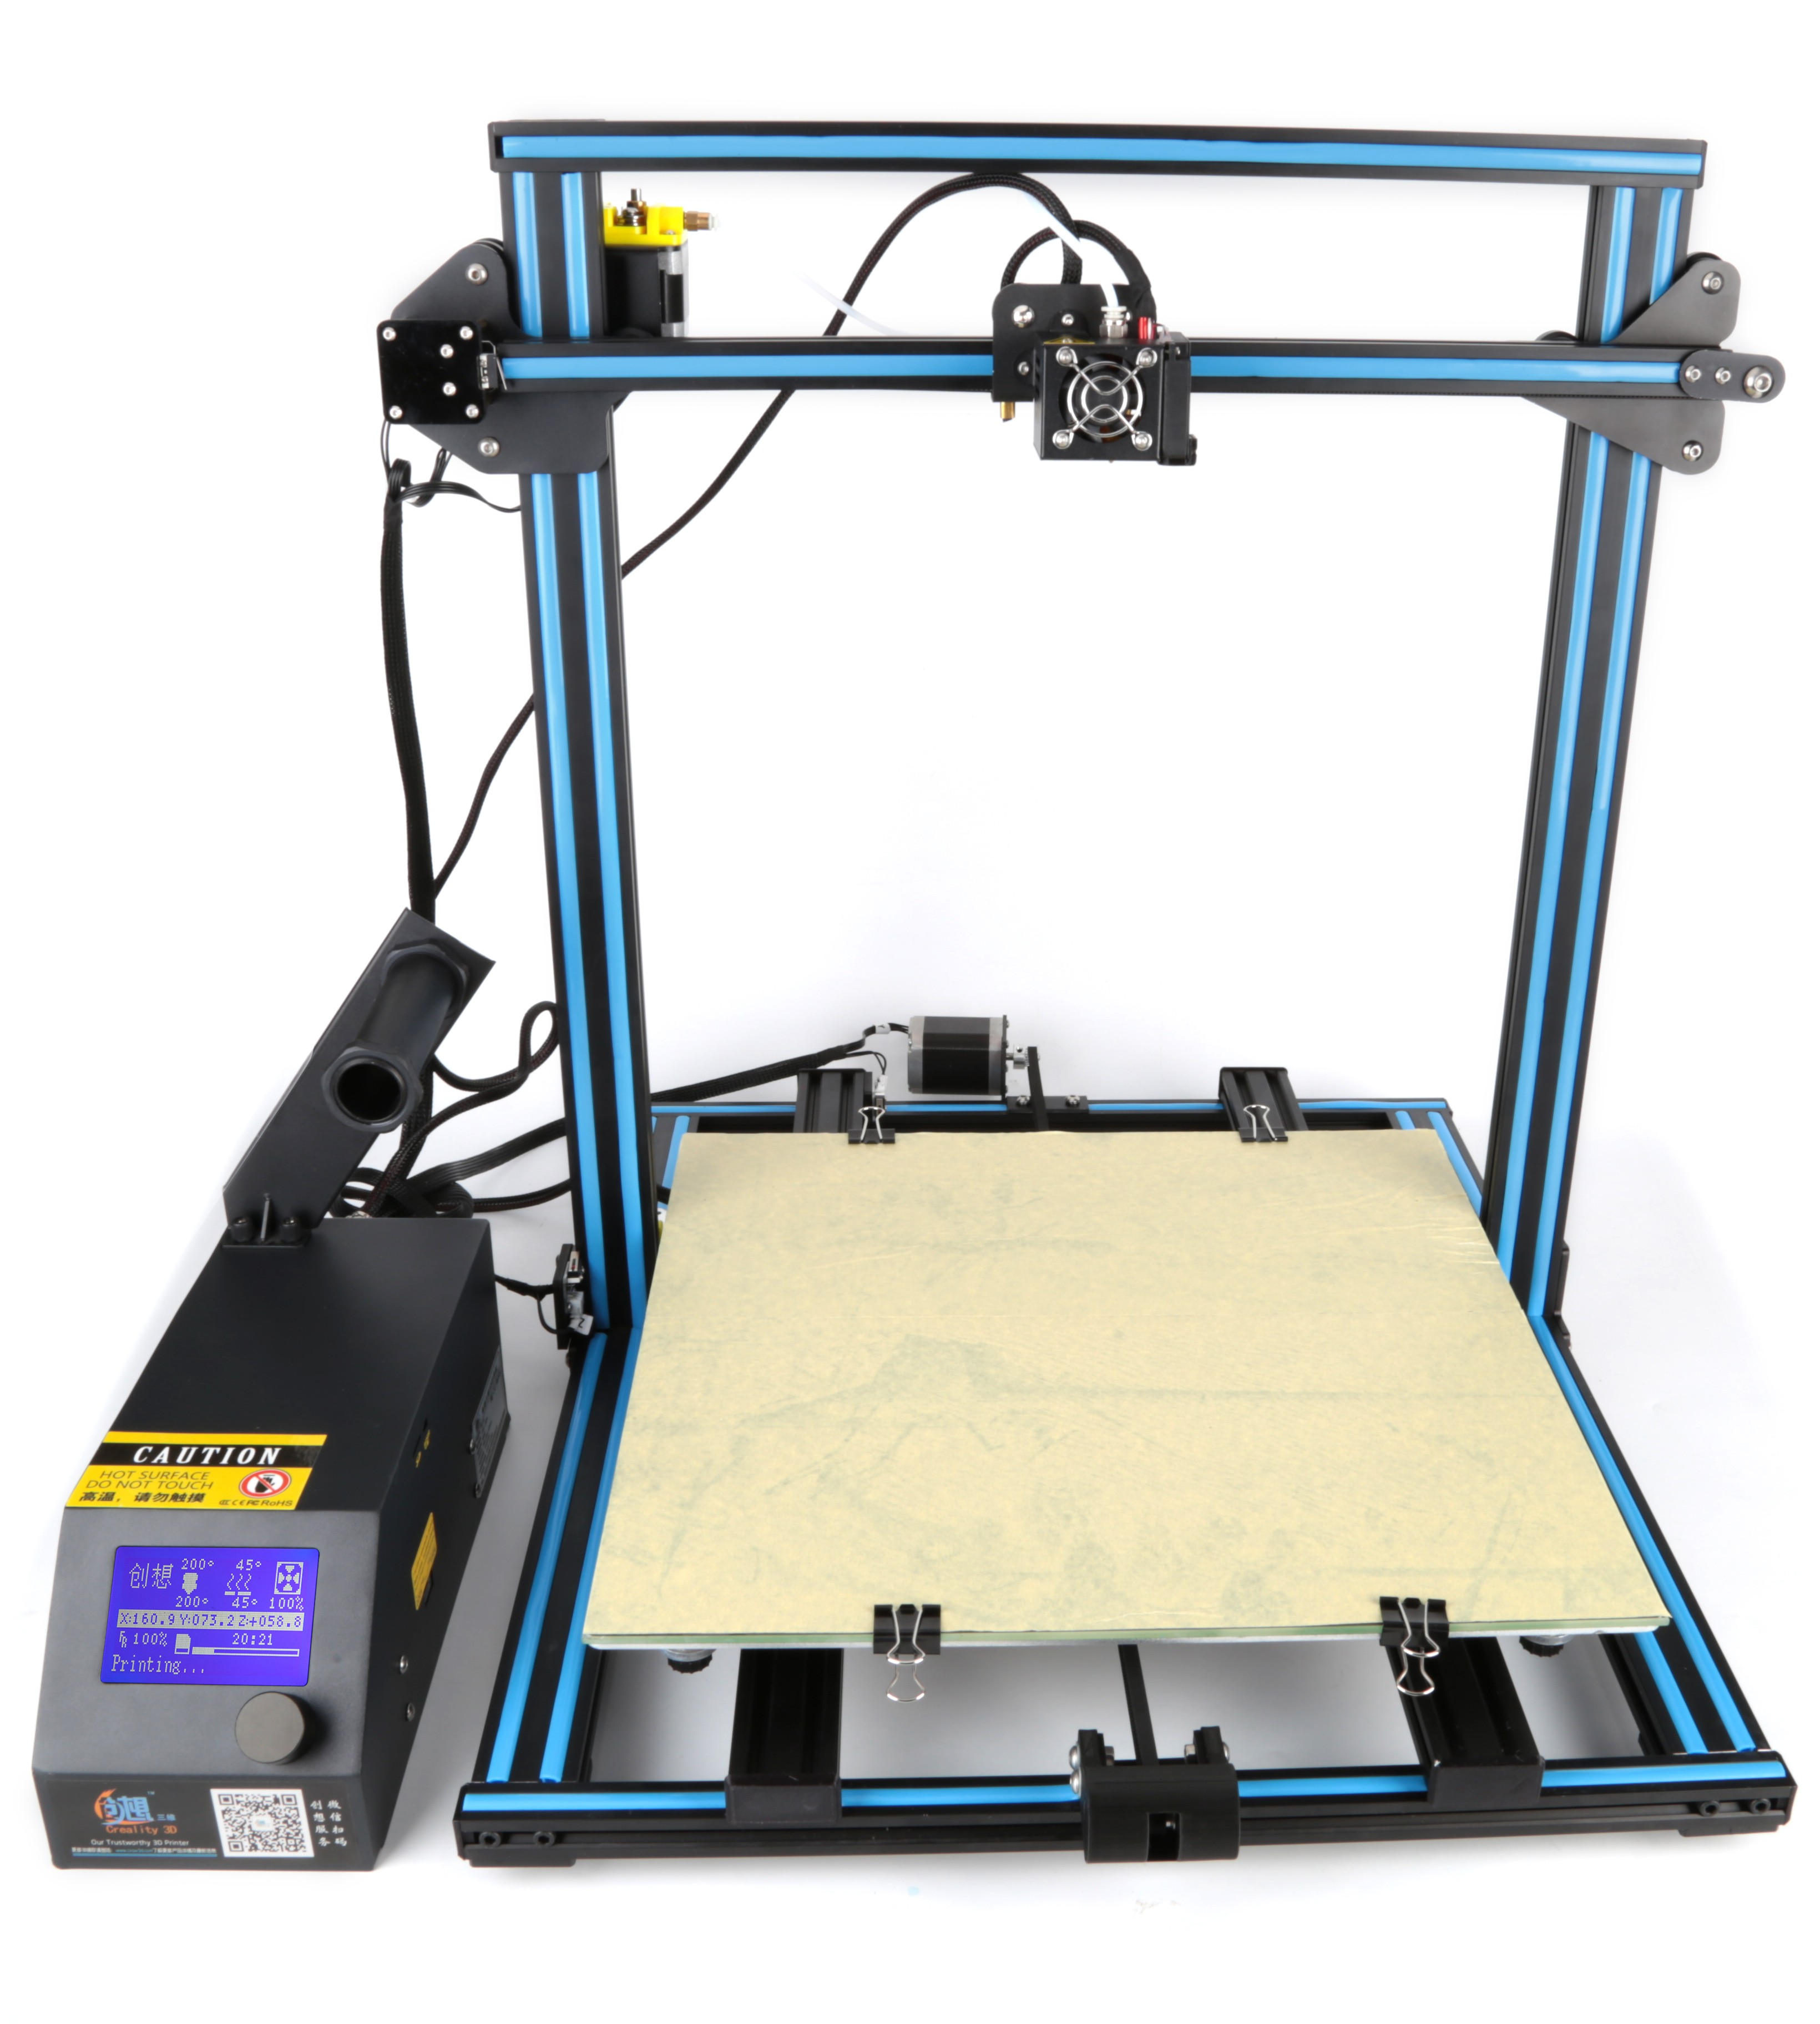 SainSmart CR-10S 3D Printer, High Precision Large Size